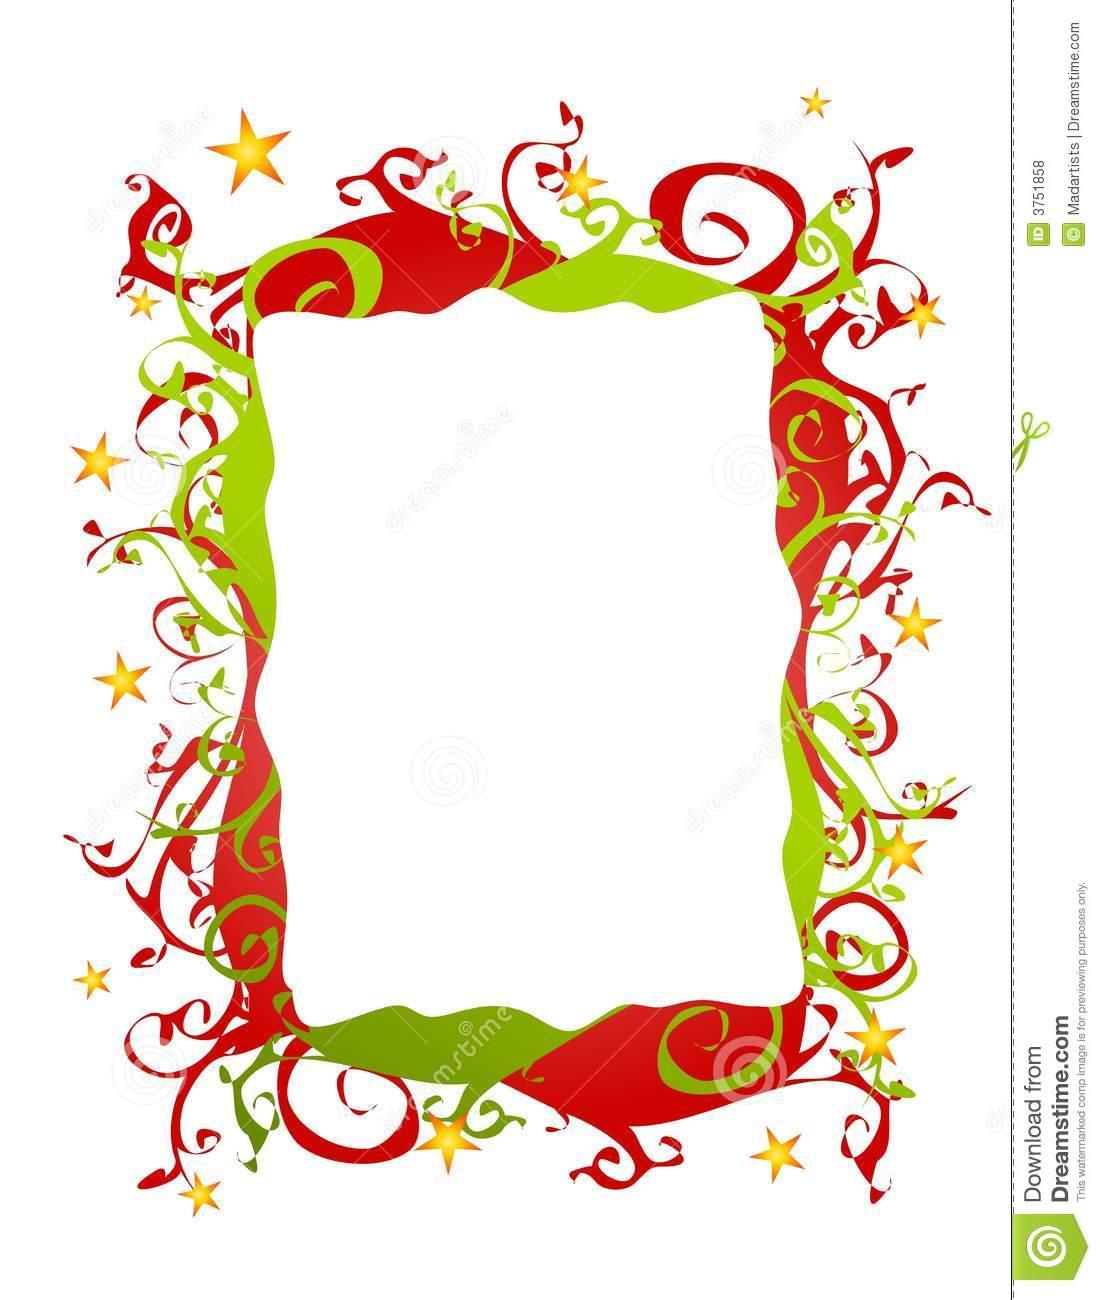 Christmas Certificate Border.Dentrodabiblia Christmas Certificate Border